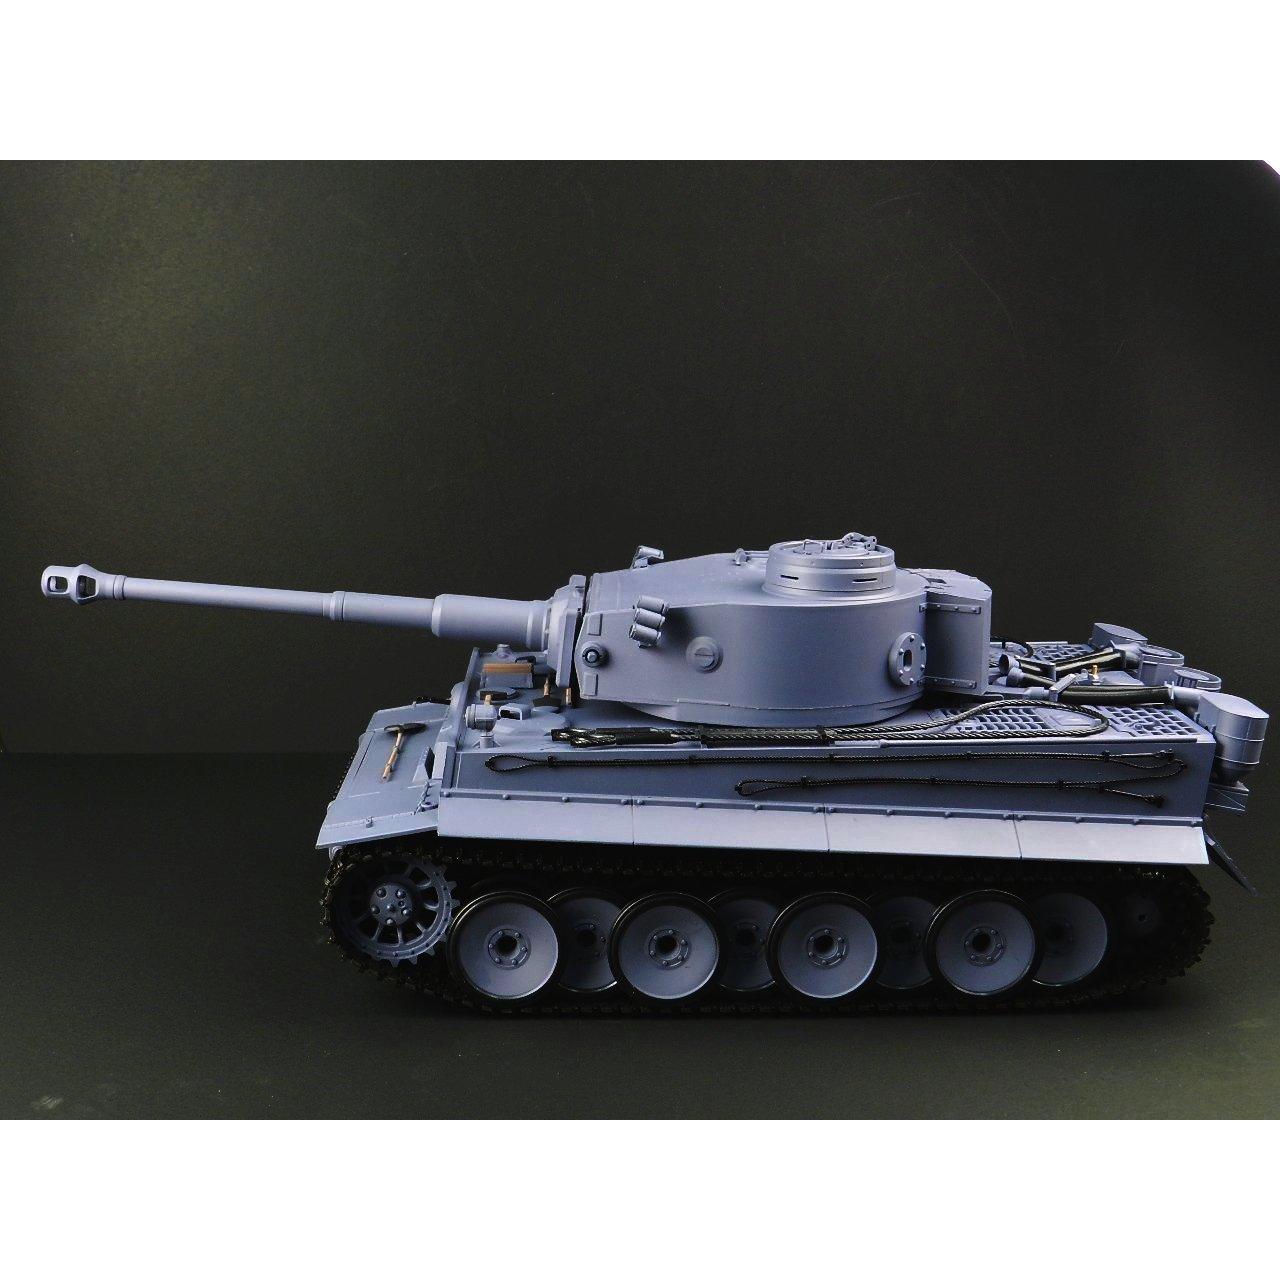 【BB弾発射サウンド発煙仕様】 HengLong 1/16 戦車ラジコン タイガーⅠ型 German Tiger I Tank B007CCESXY